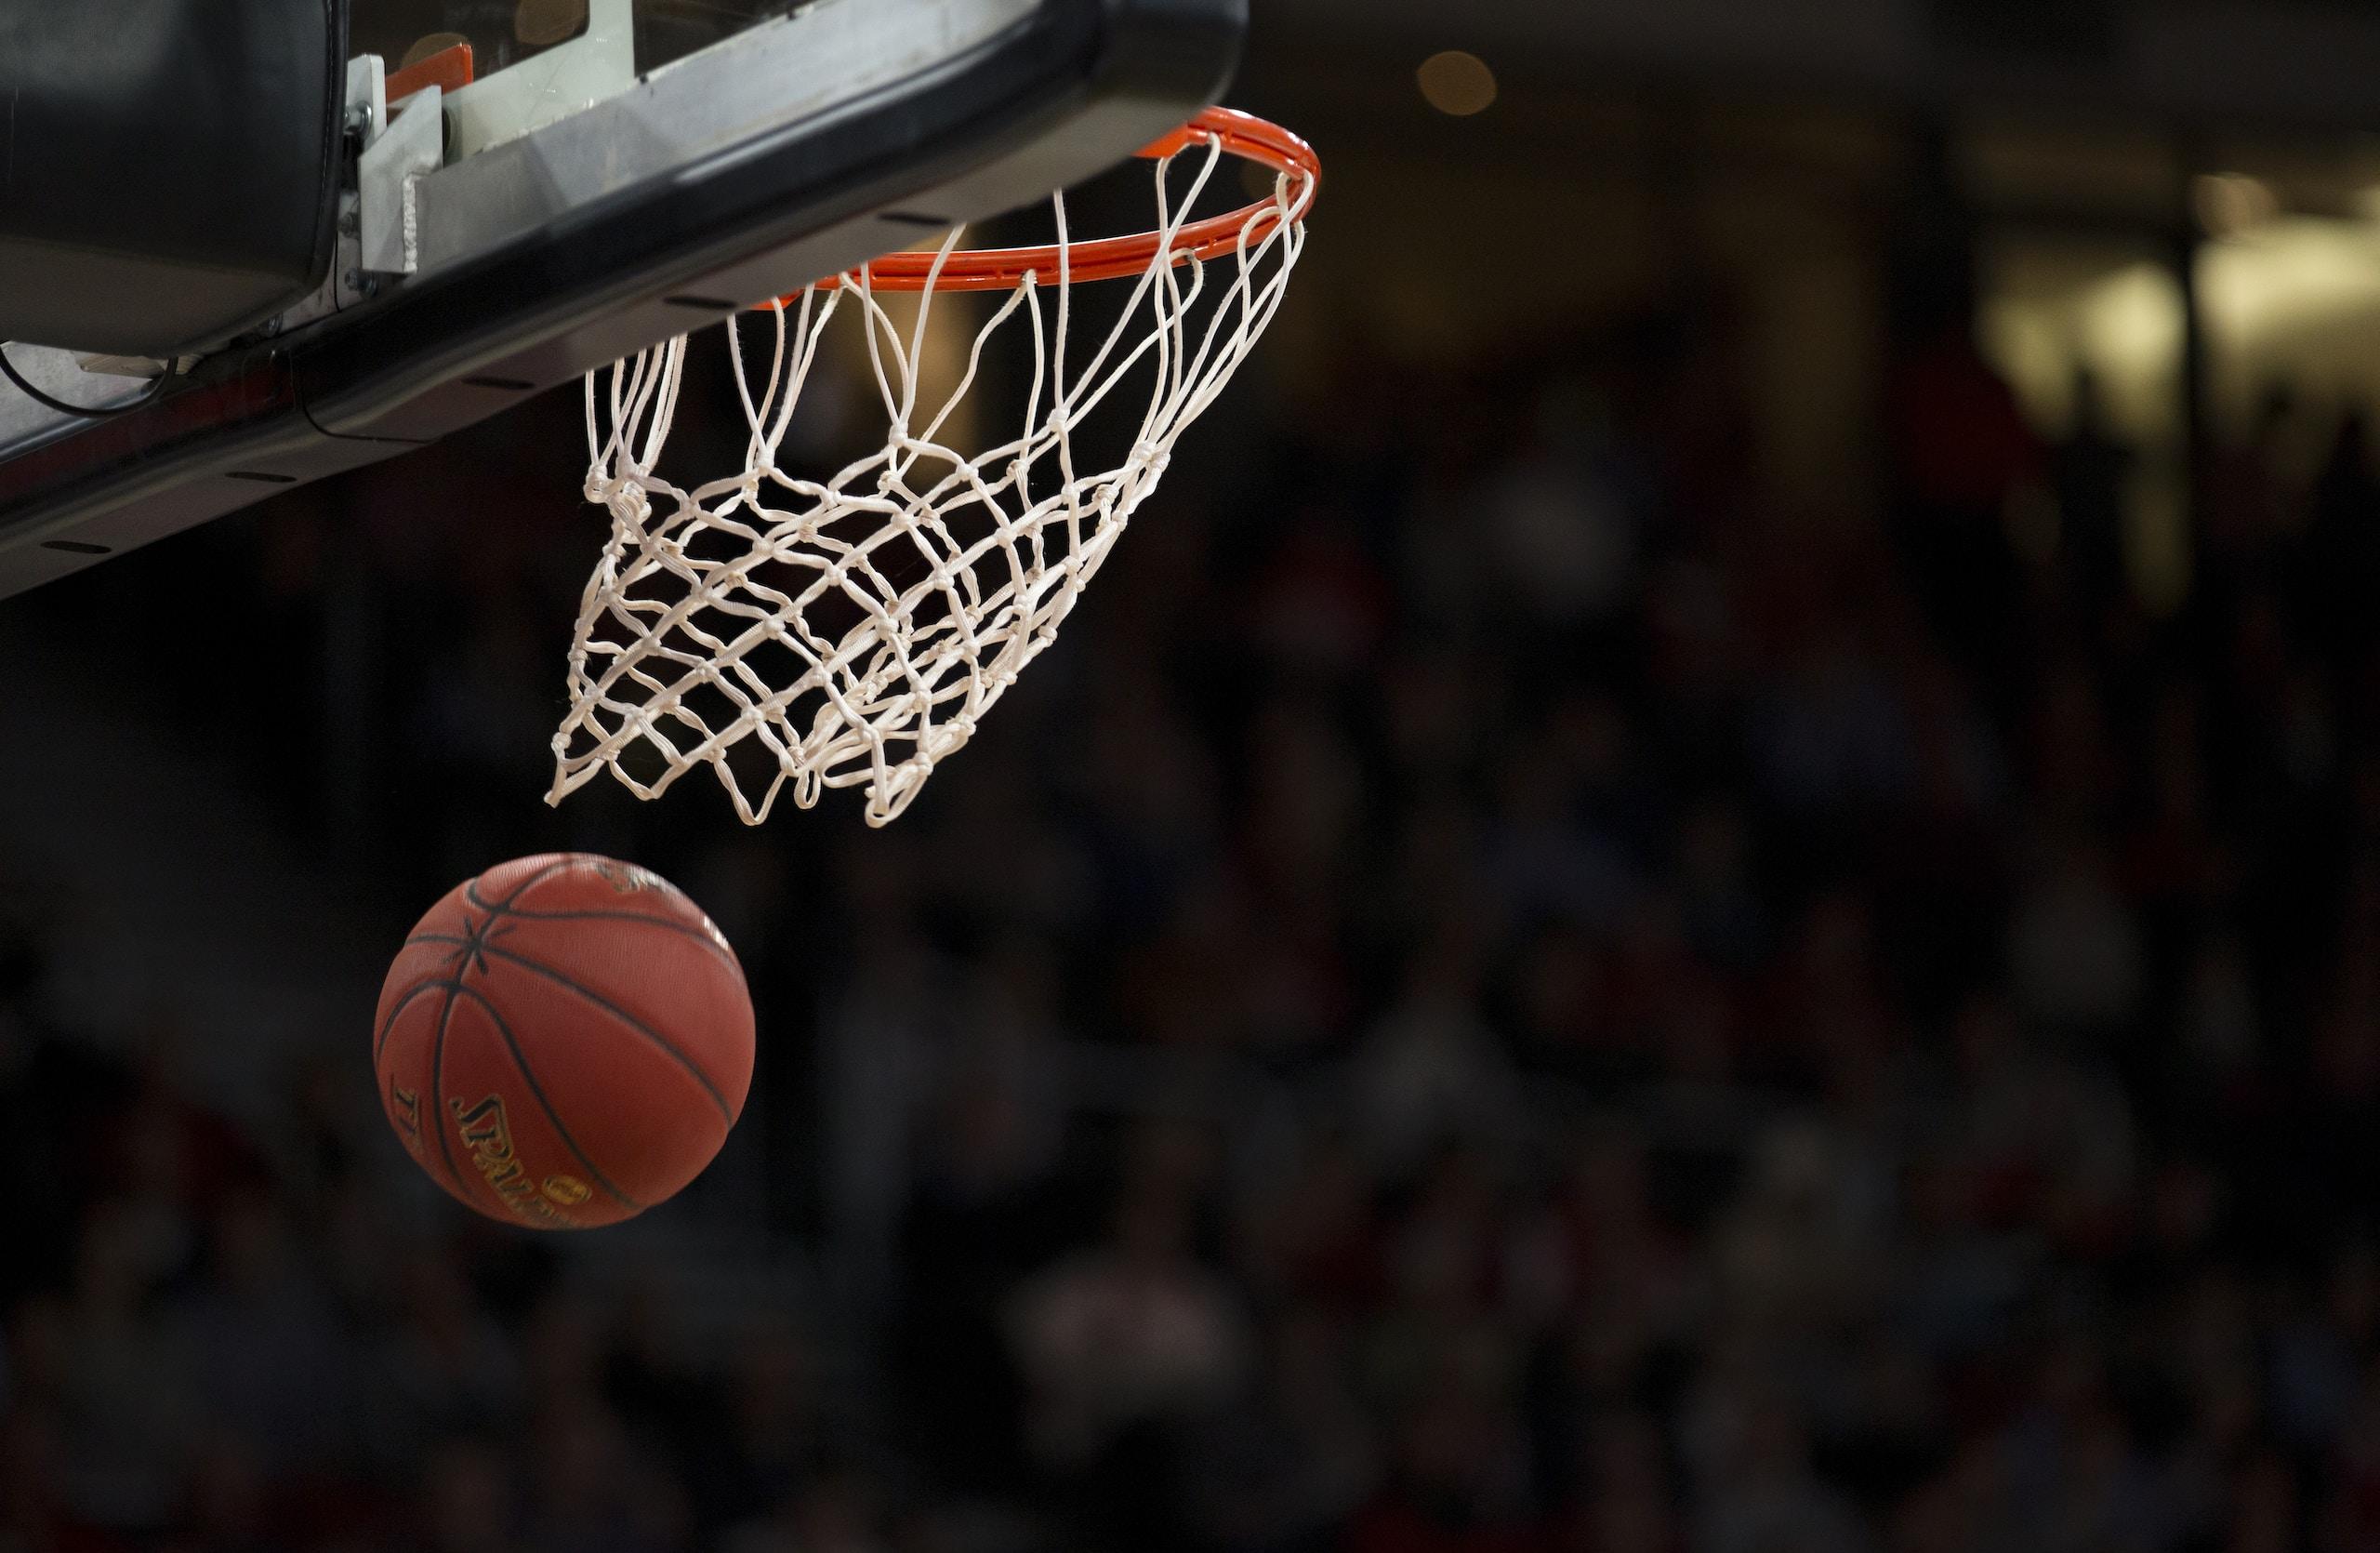 Irving, ball under basketball ring